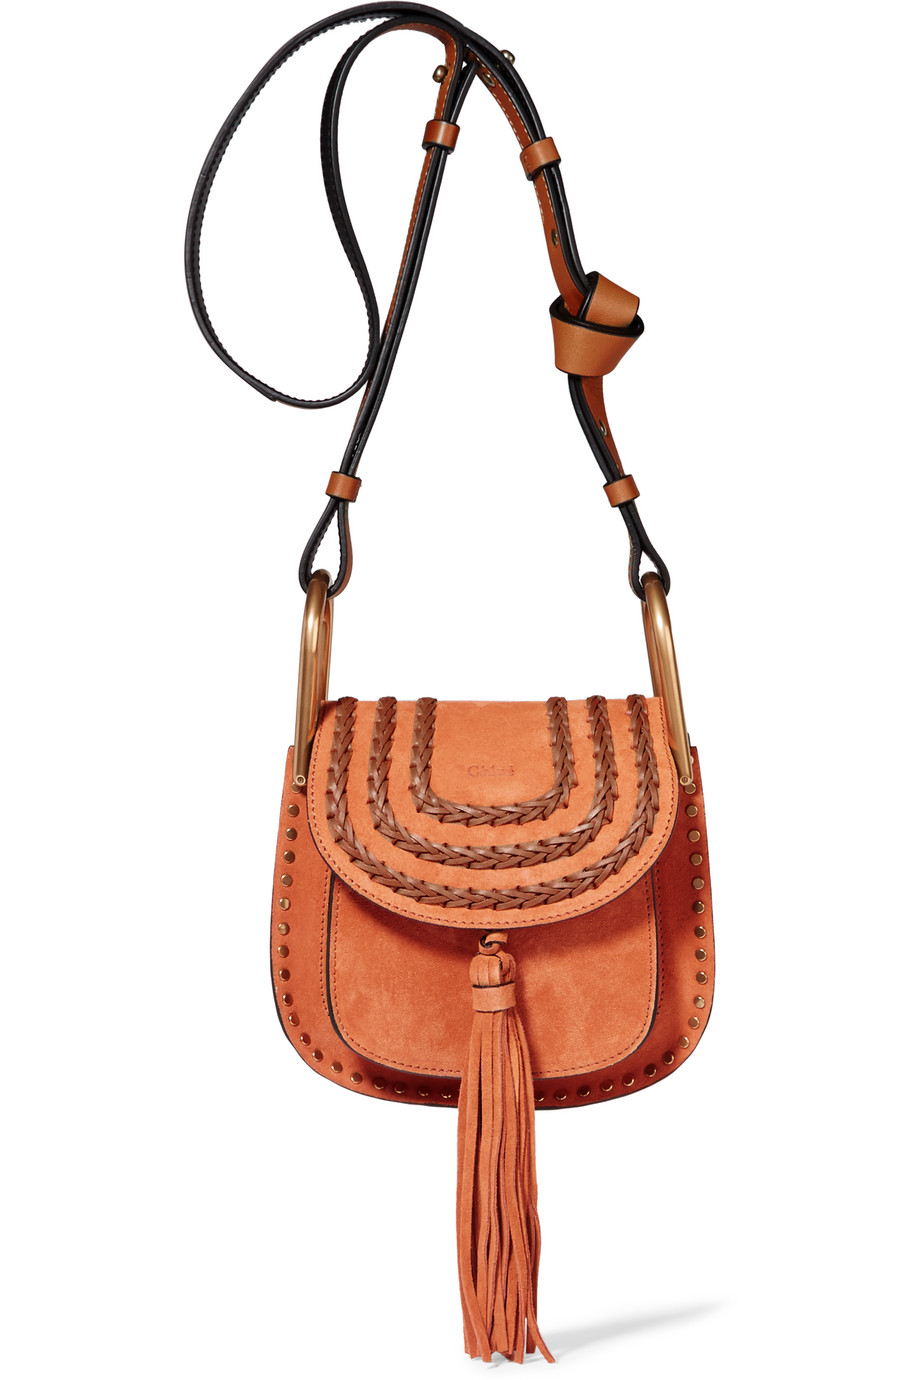 Chloé Hudson Mini Whipstitched Suede Shoulder Bag, Light Brown, Women's